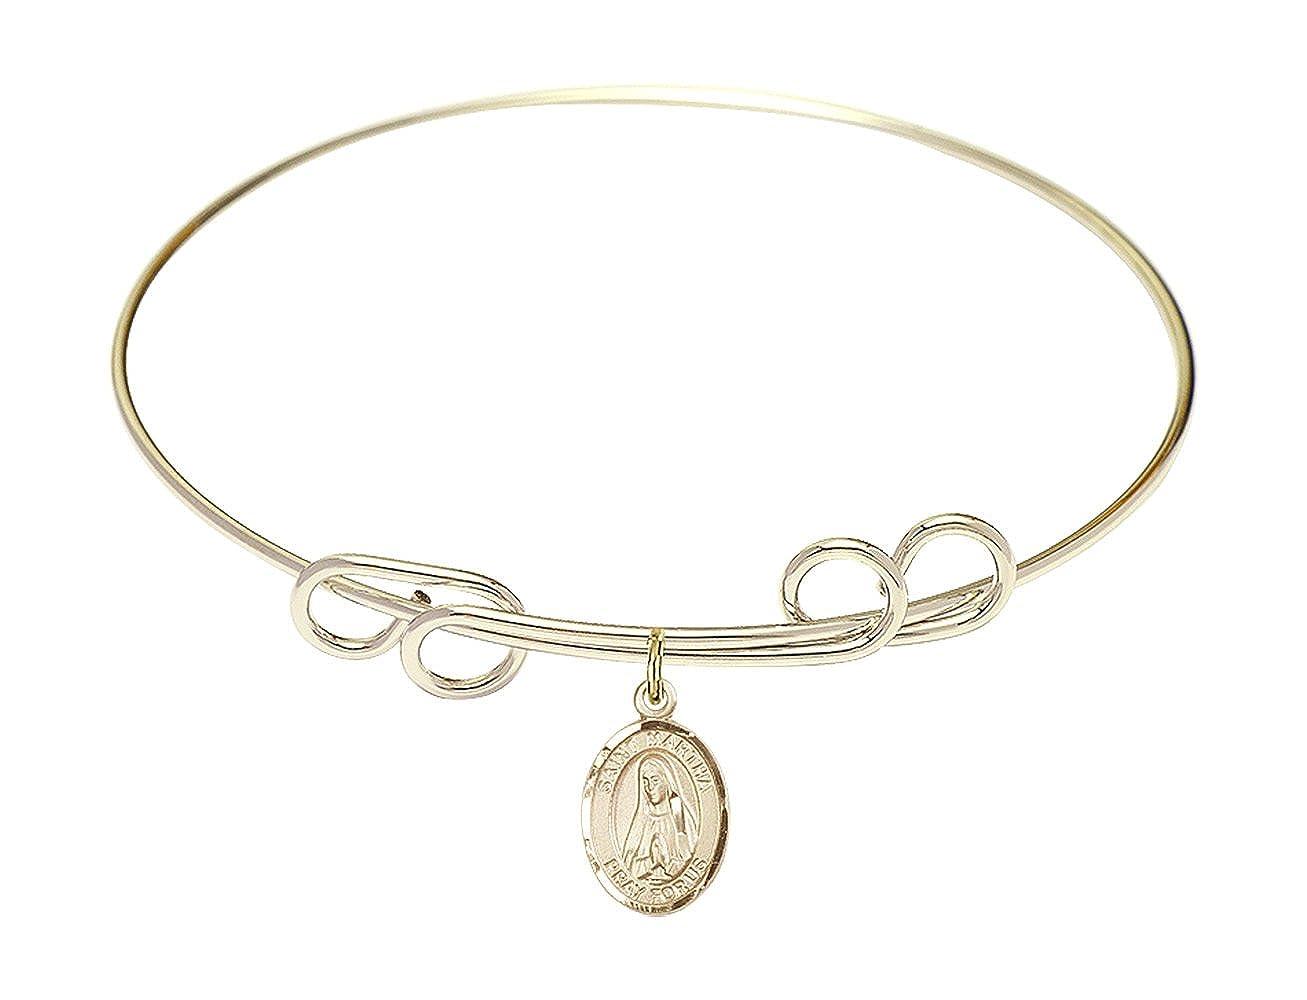 DiamondJewelryNY Double Loop Bangle Bracelet with a St Martha Charm.